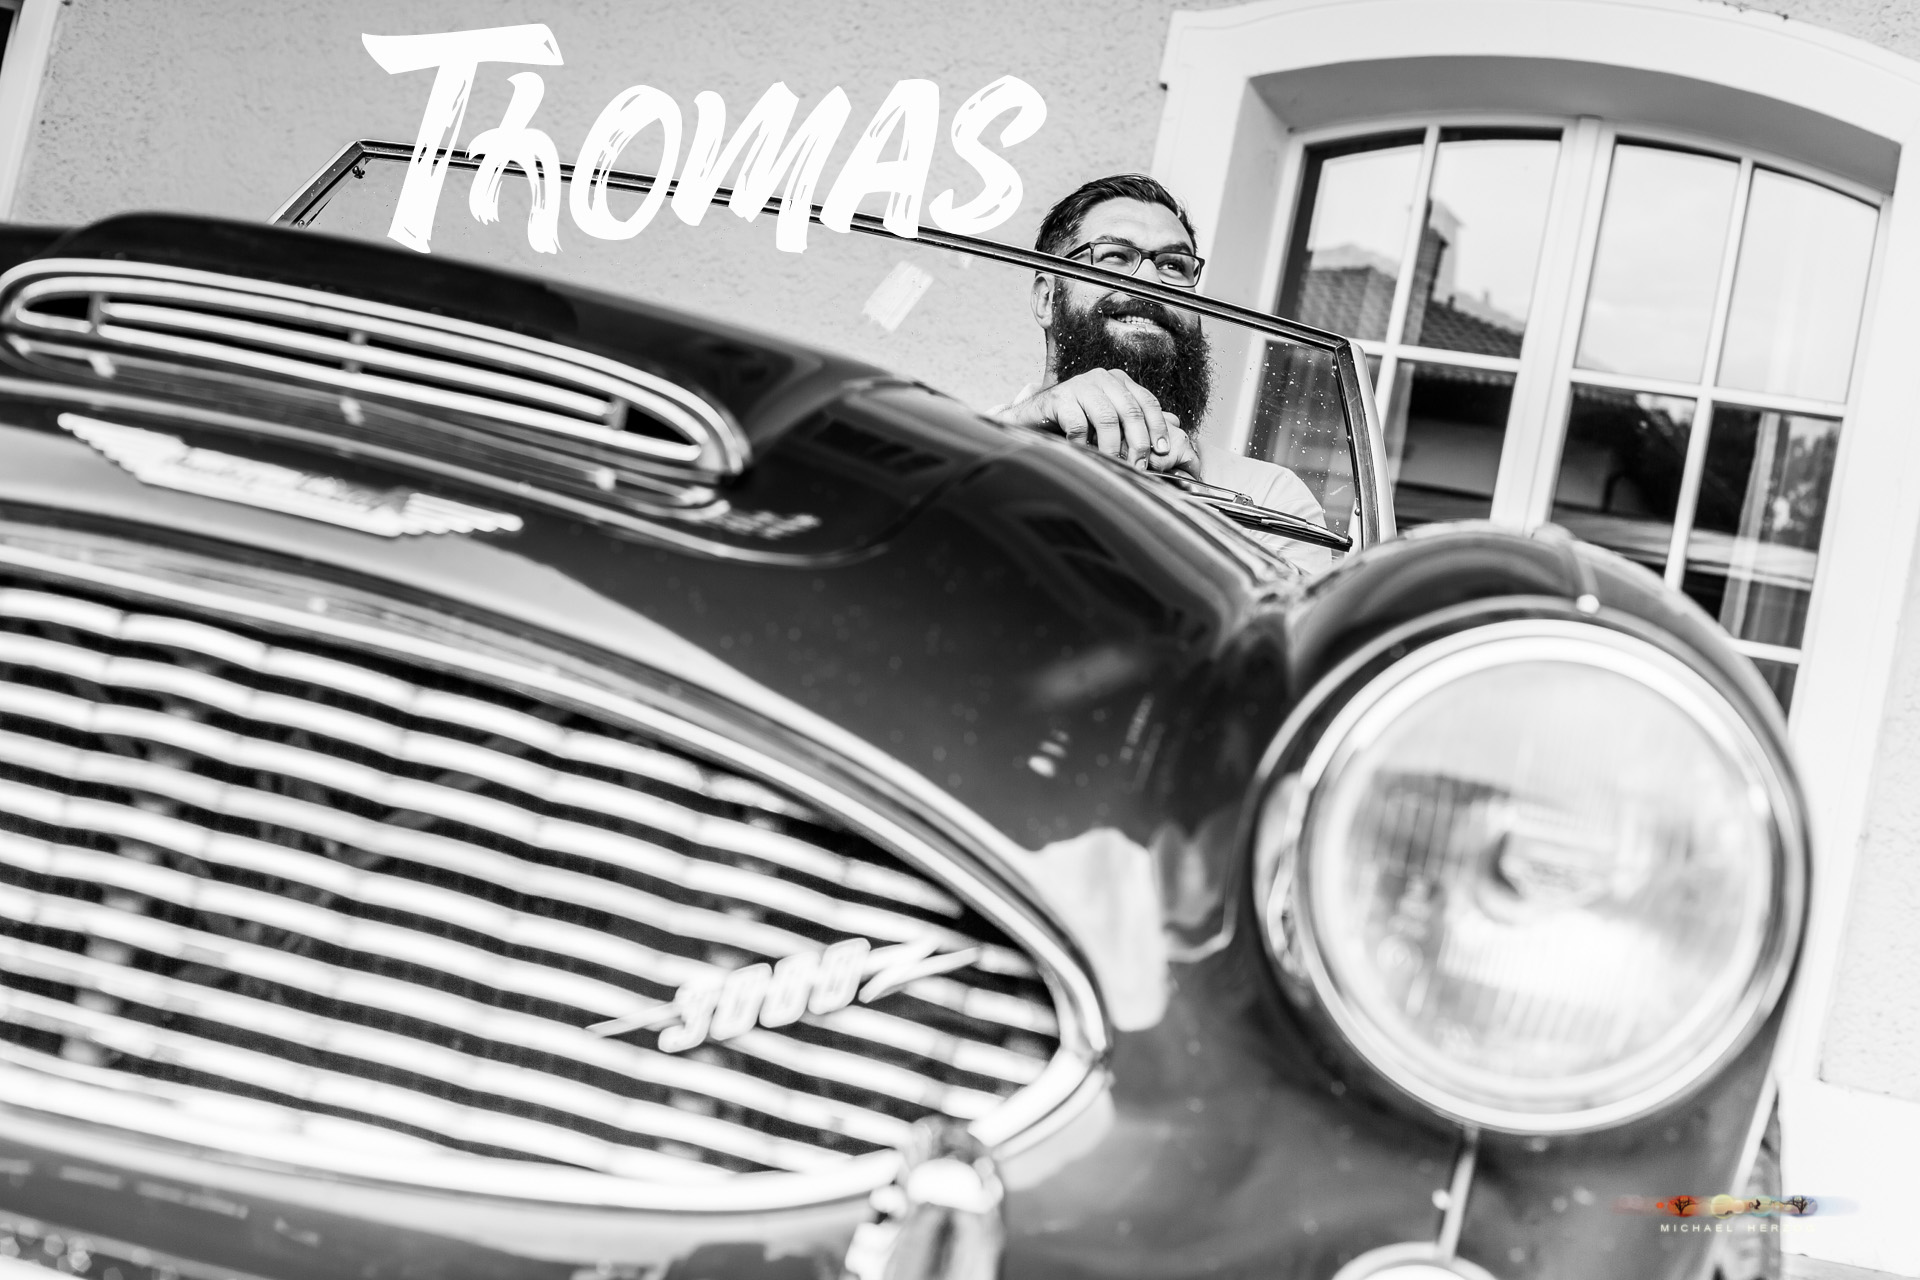 ThomasWinkler_Camaro_AUTrenalinMEDIA-6132-TOM1.jpg